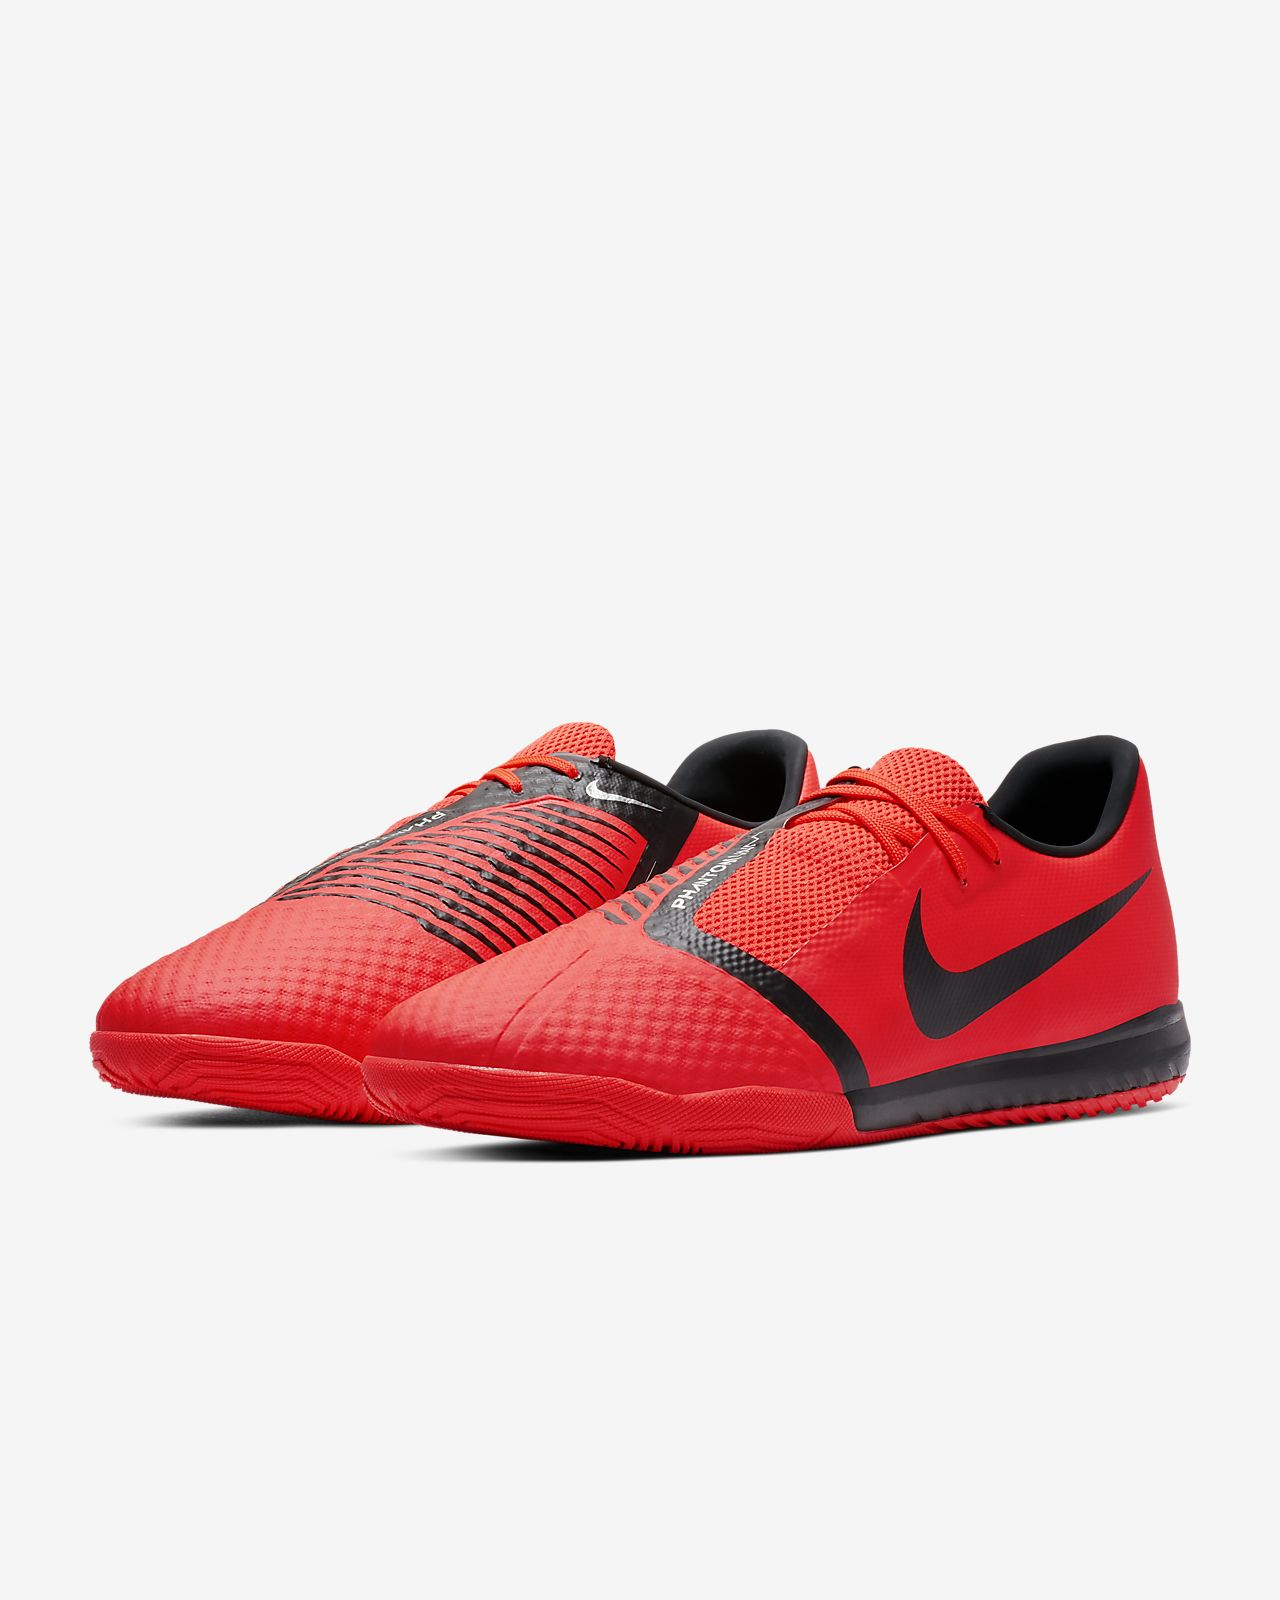 88df5ff001cf Nike PhantomVNM Academy IC Game Over Indoor Court Football Boot ...